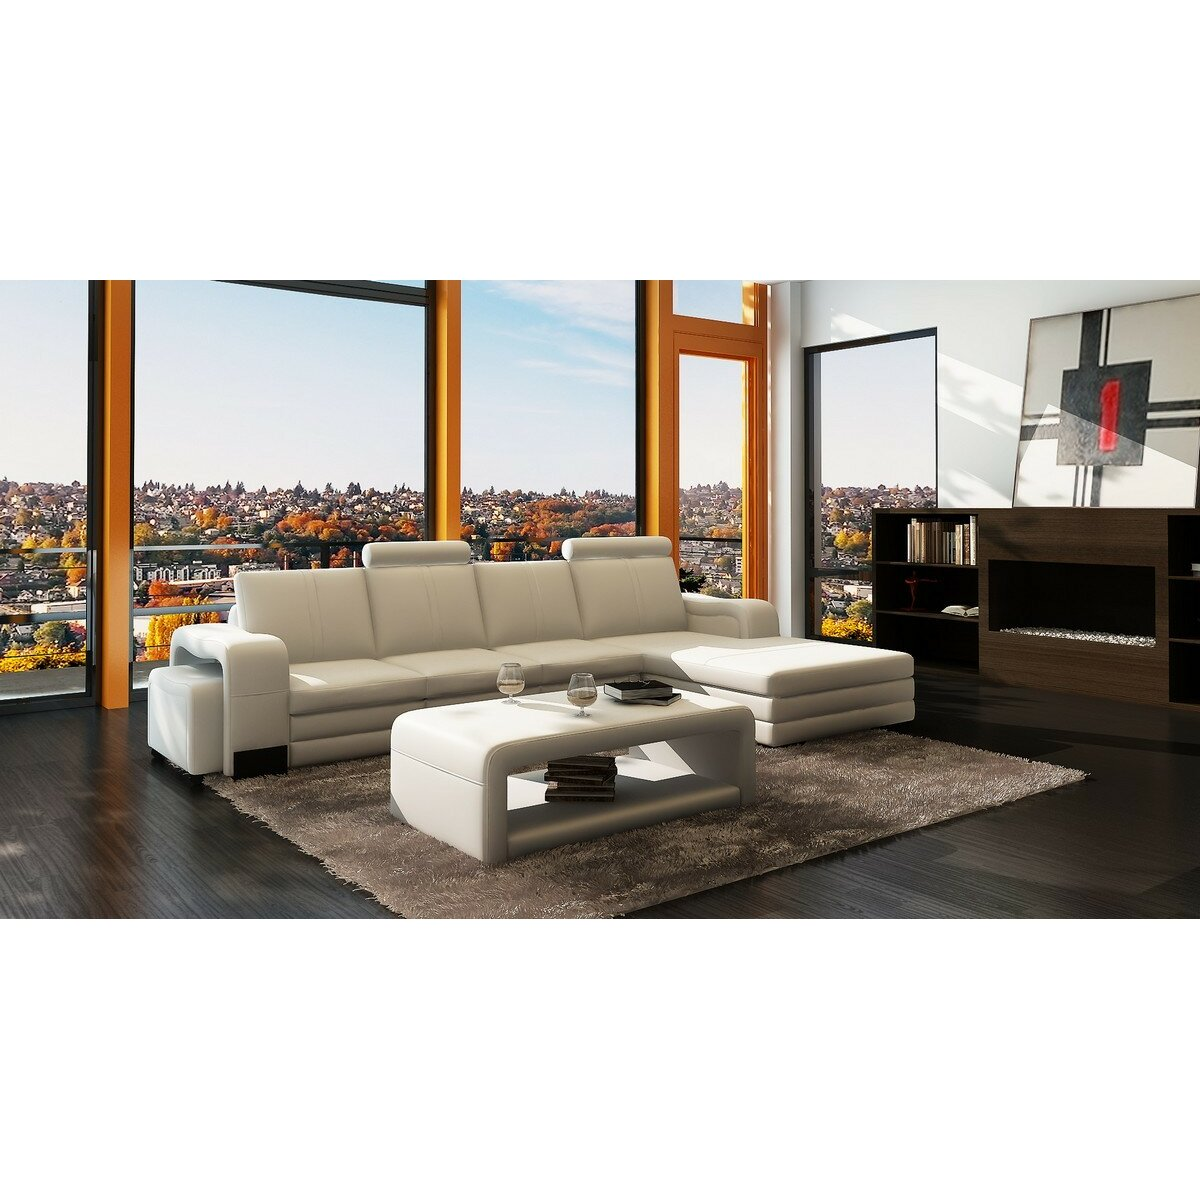 Hokku designs marino 2 piece living room set wayfair for 2 piece living room set